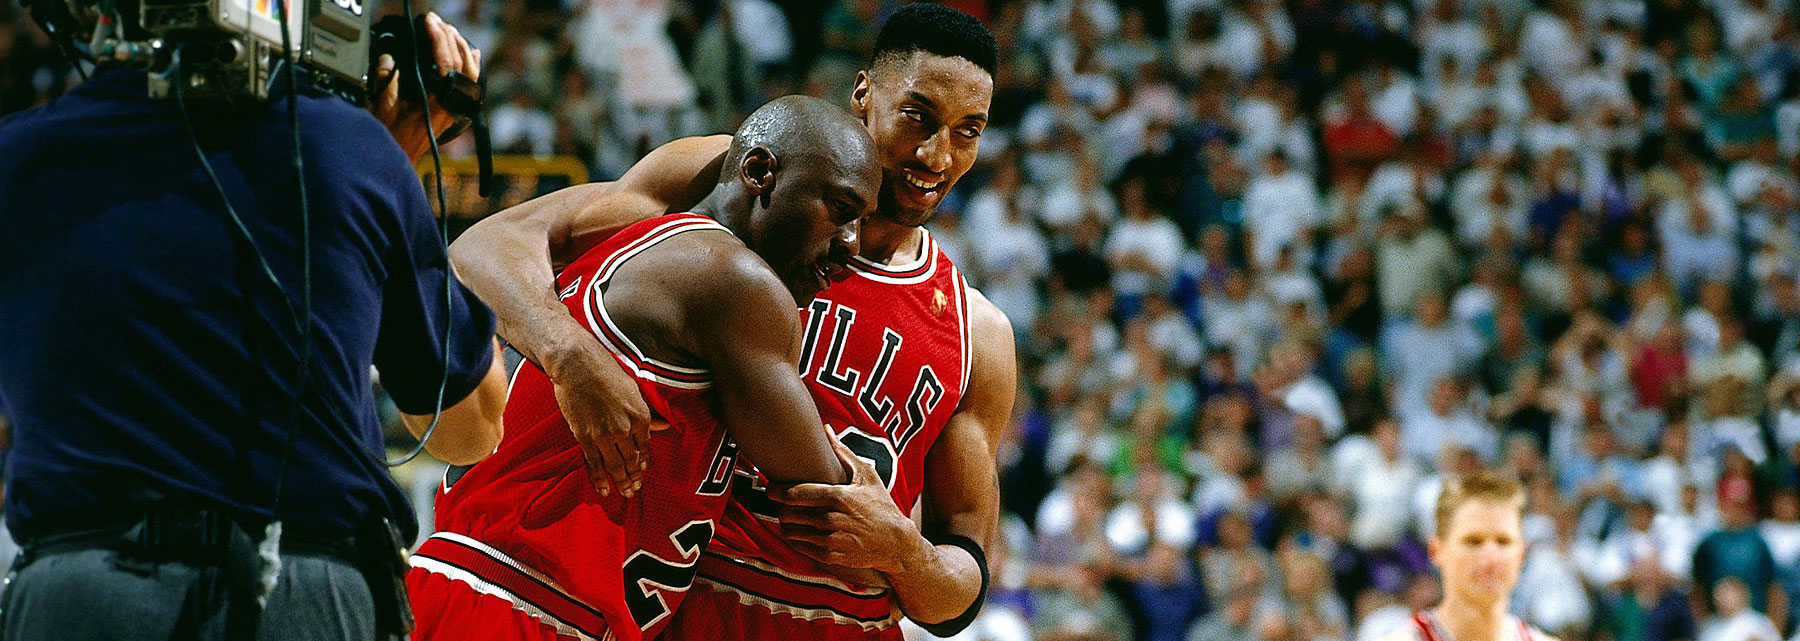 Jordan and Pippen celebrate